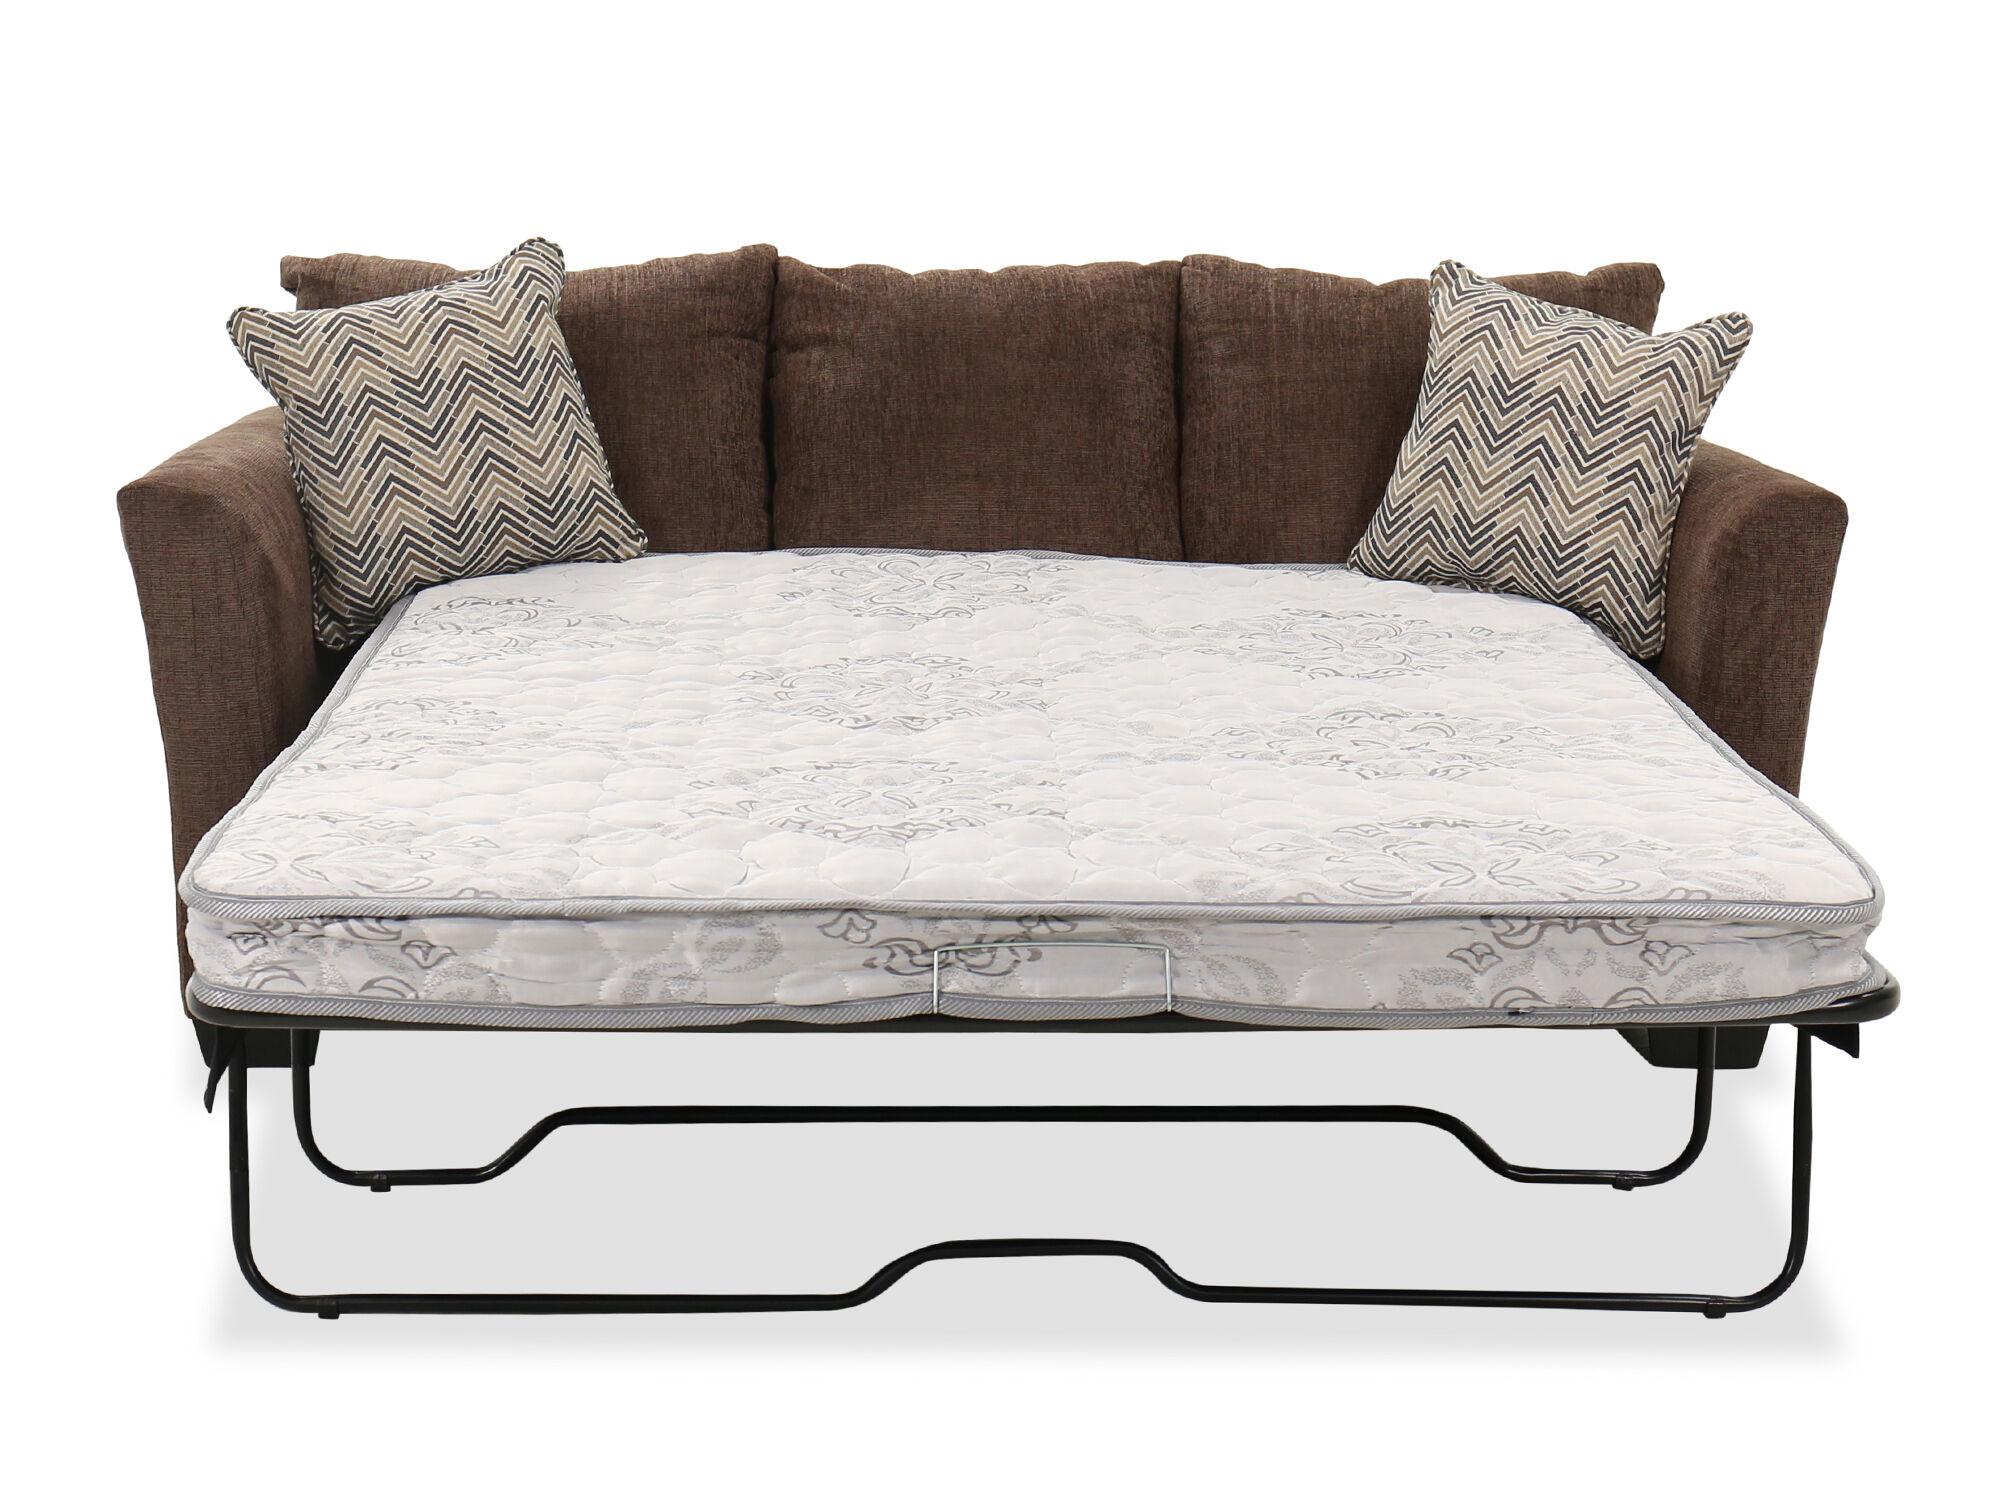 84 Casual Queen Sleeper Sofa In Brown, Brown Fabric Sleeper Sofa